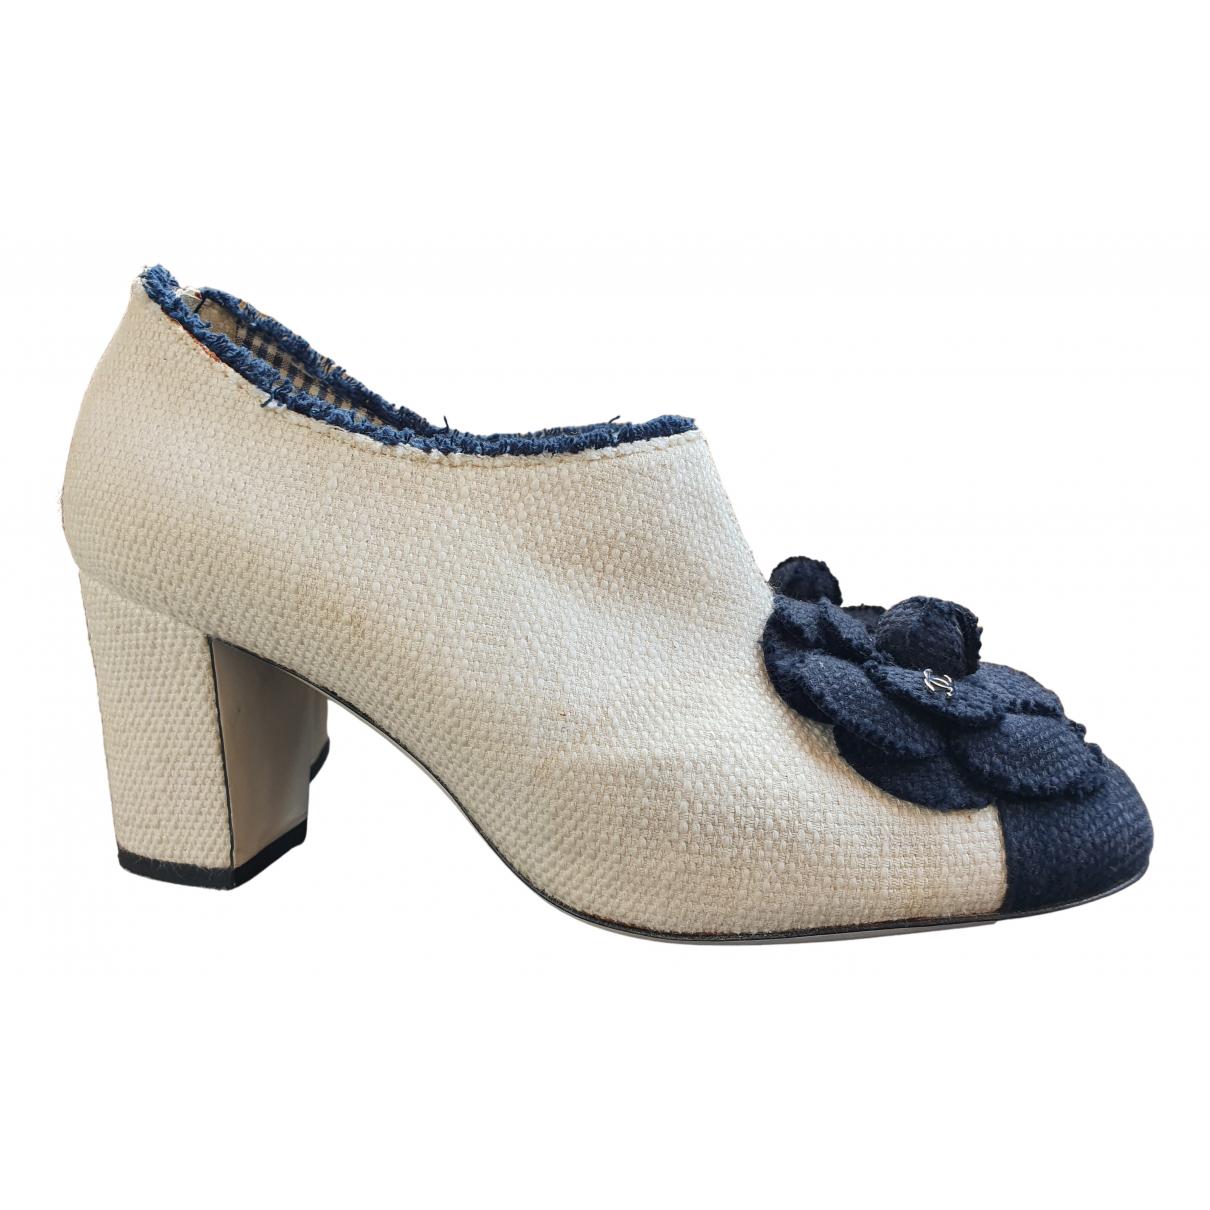 Chanel \N Cloth Boots for Women 39 EU